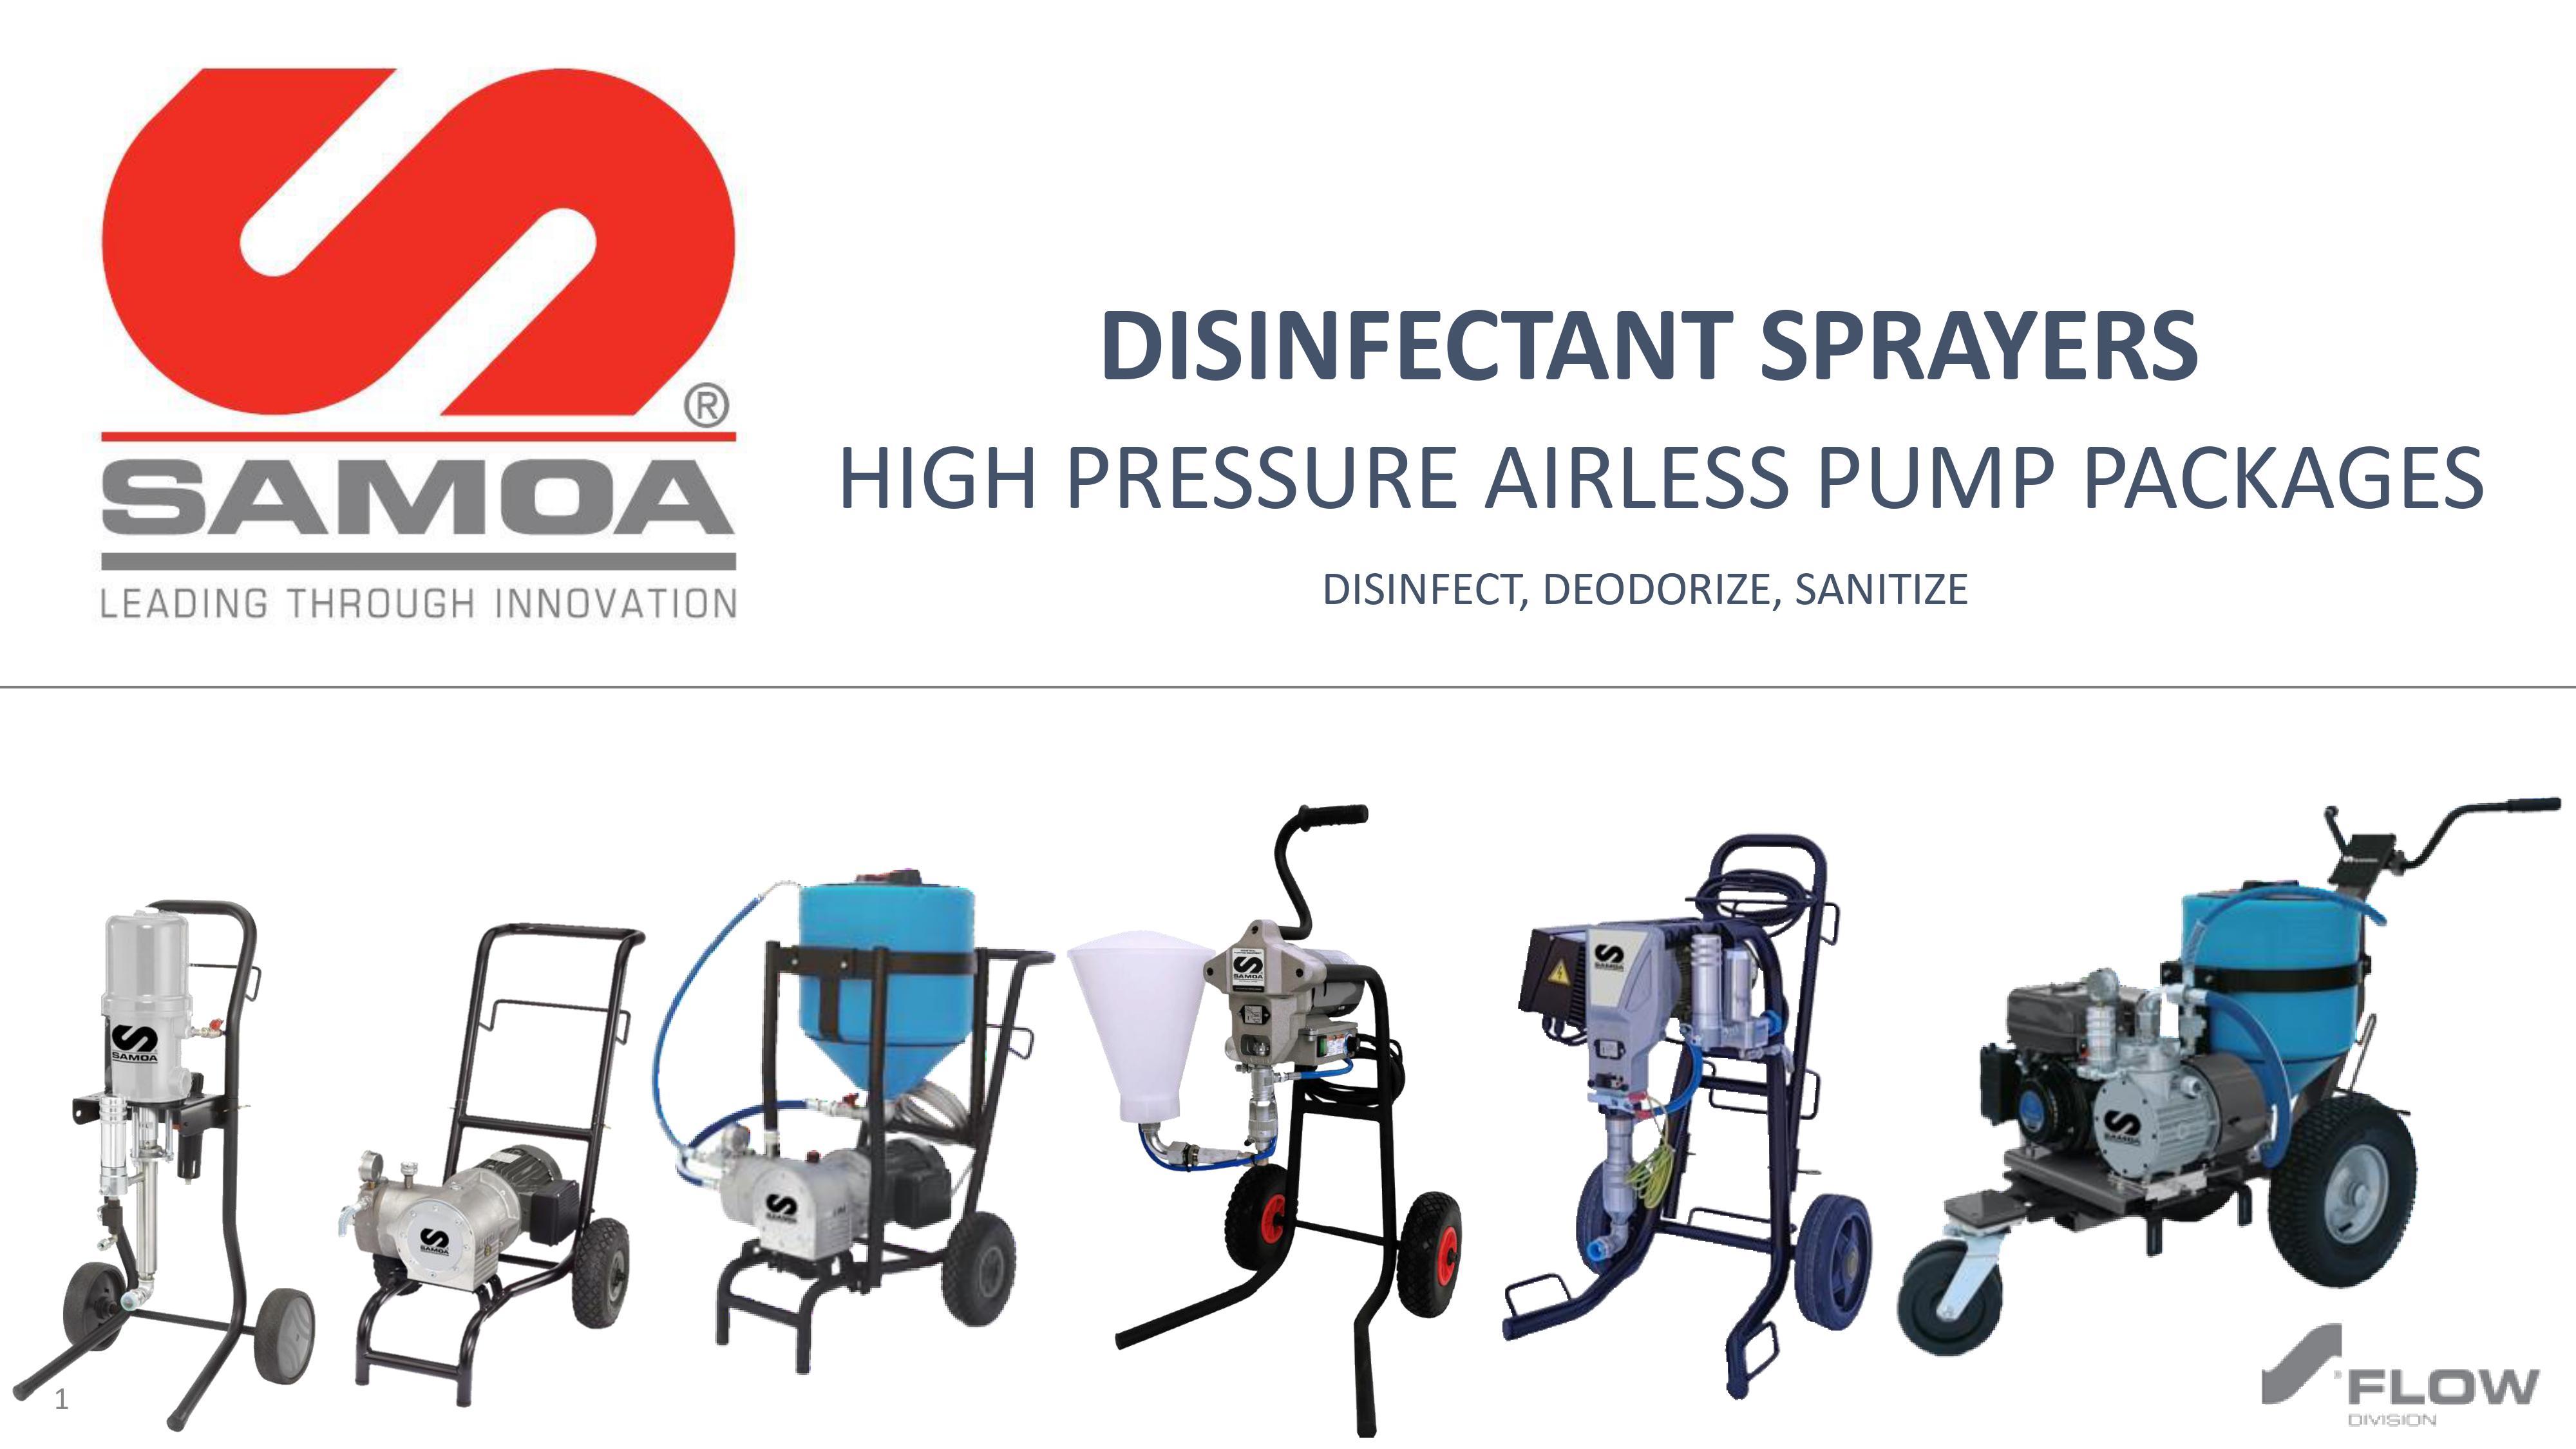 SAMOA Disinfectant Sprayers